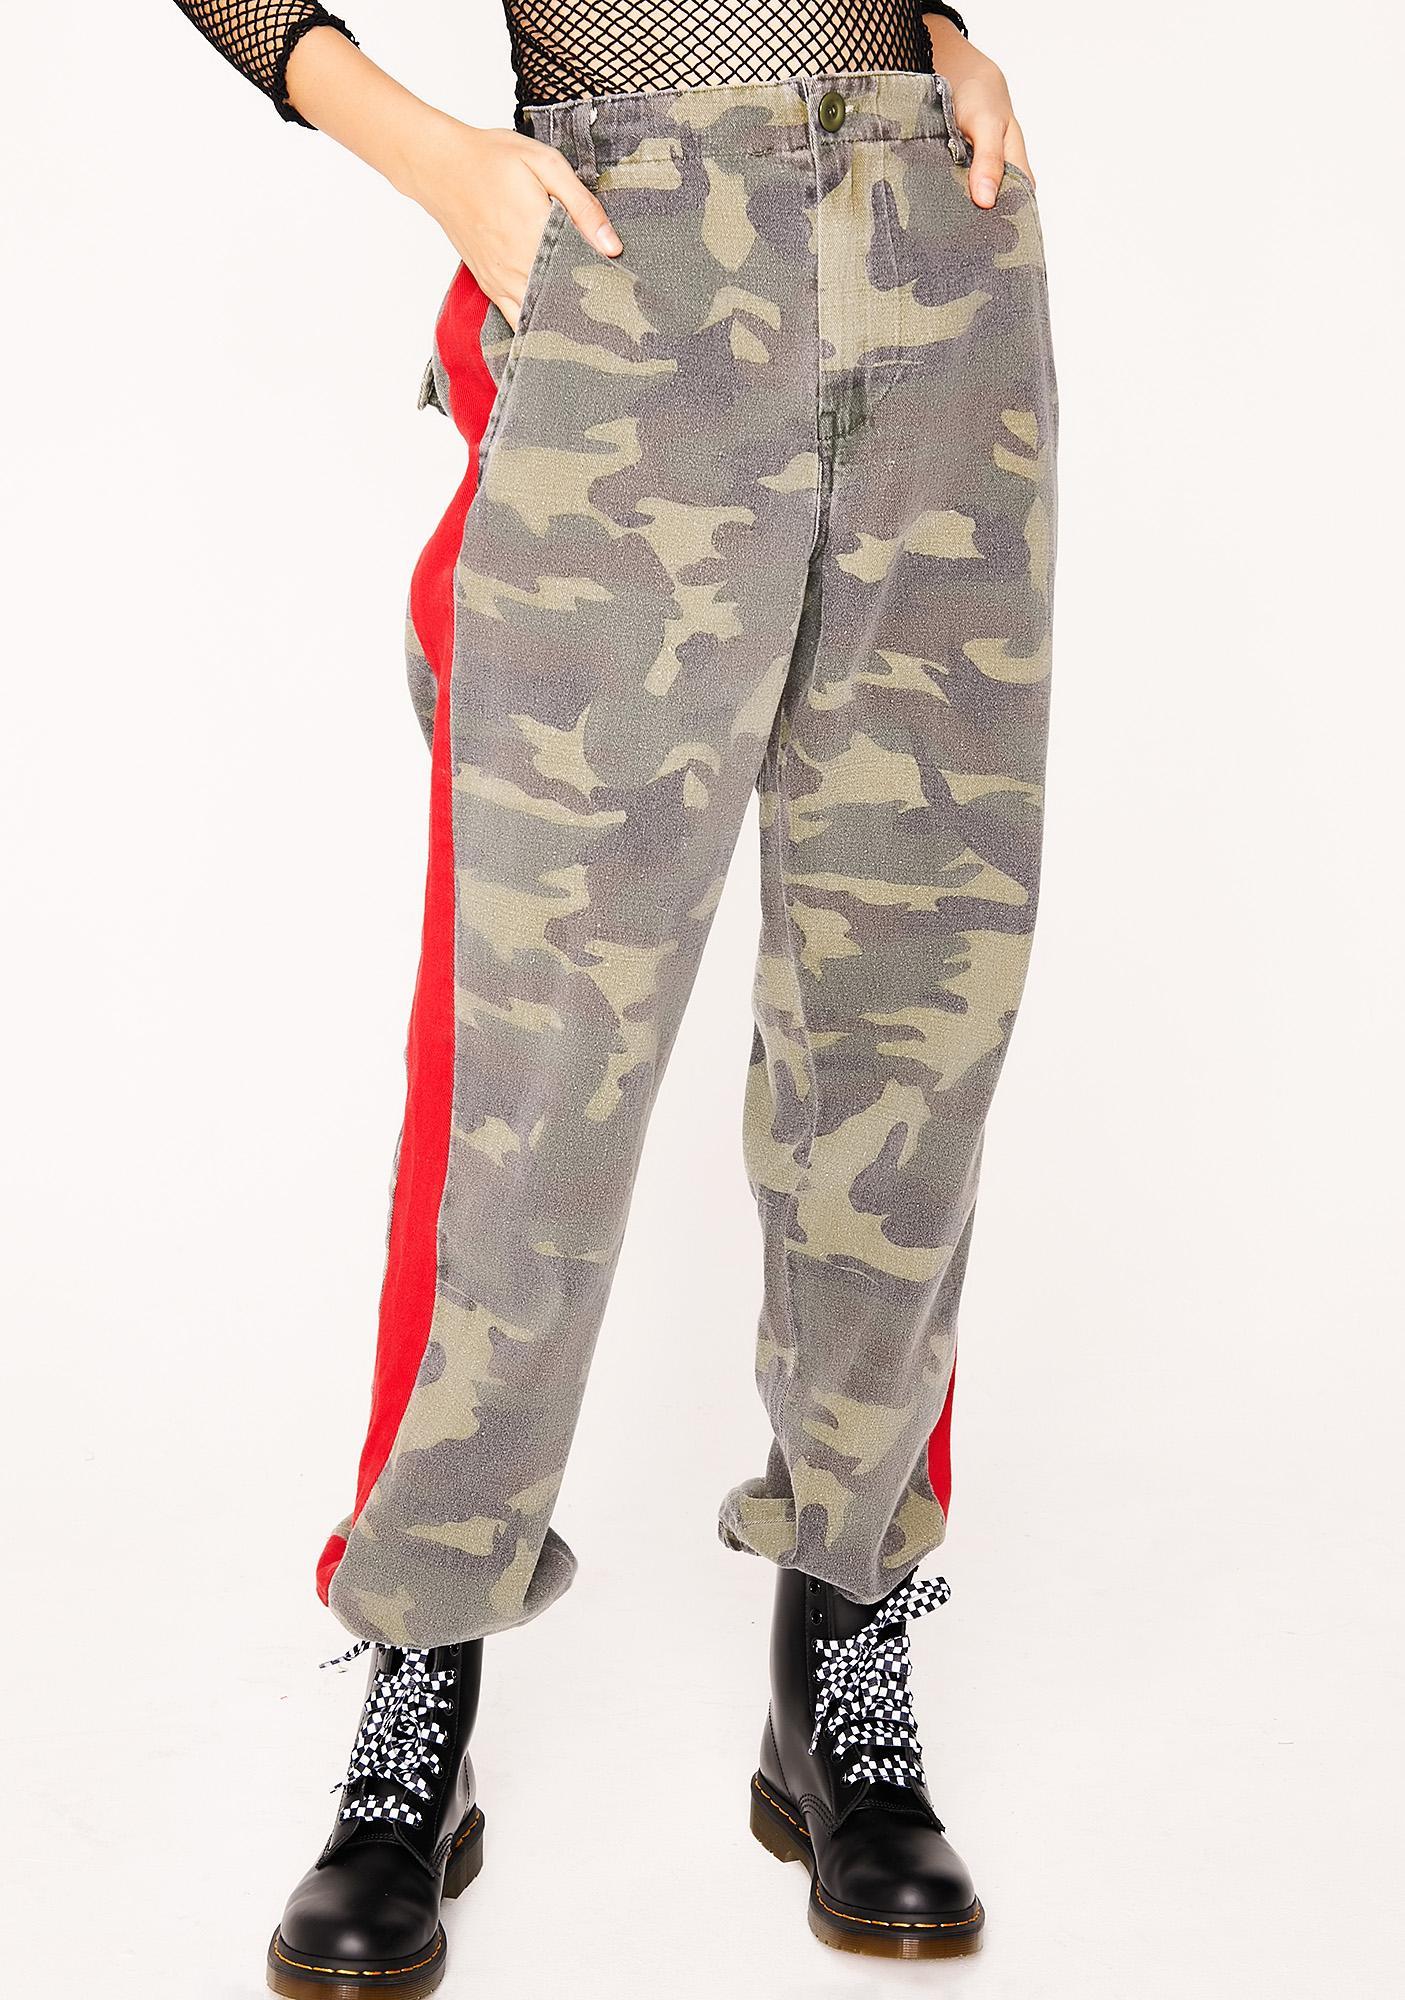 f6b3f68b0bb Concealed Identity Camo Pants